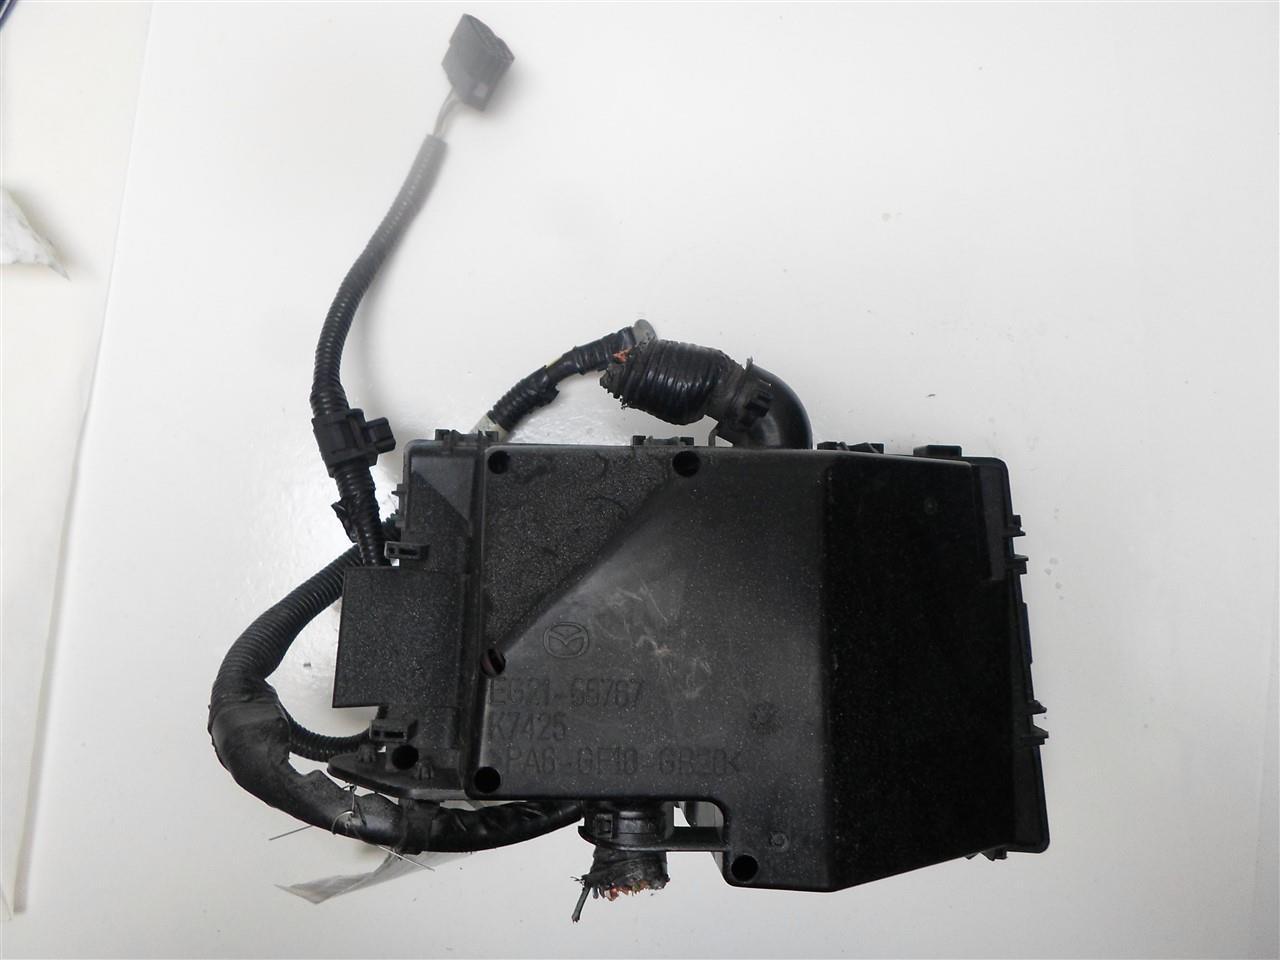 [SCHEMATICS_48IS]  FUSE BOX RELAY MAZDA CX-7 2007 2008 2009 2010 2011 2012 EG21-66767 OEM    eBay   Mazda Cx7 2007 Fuse Box      eBay